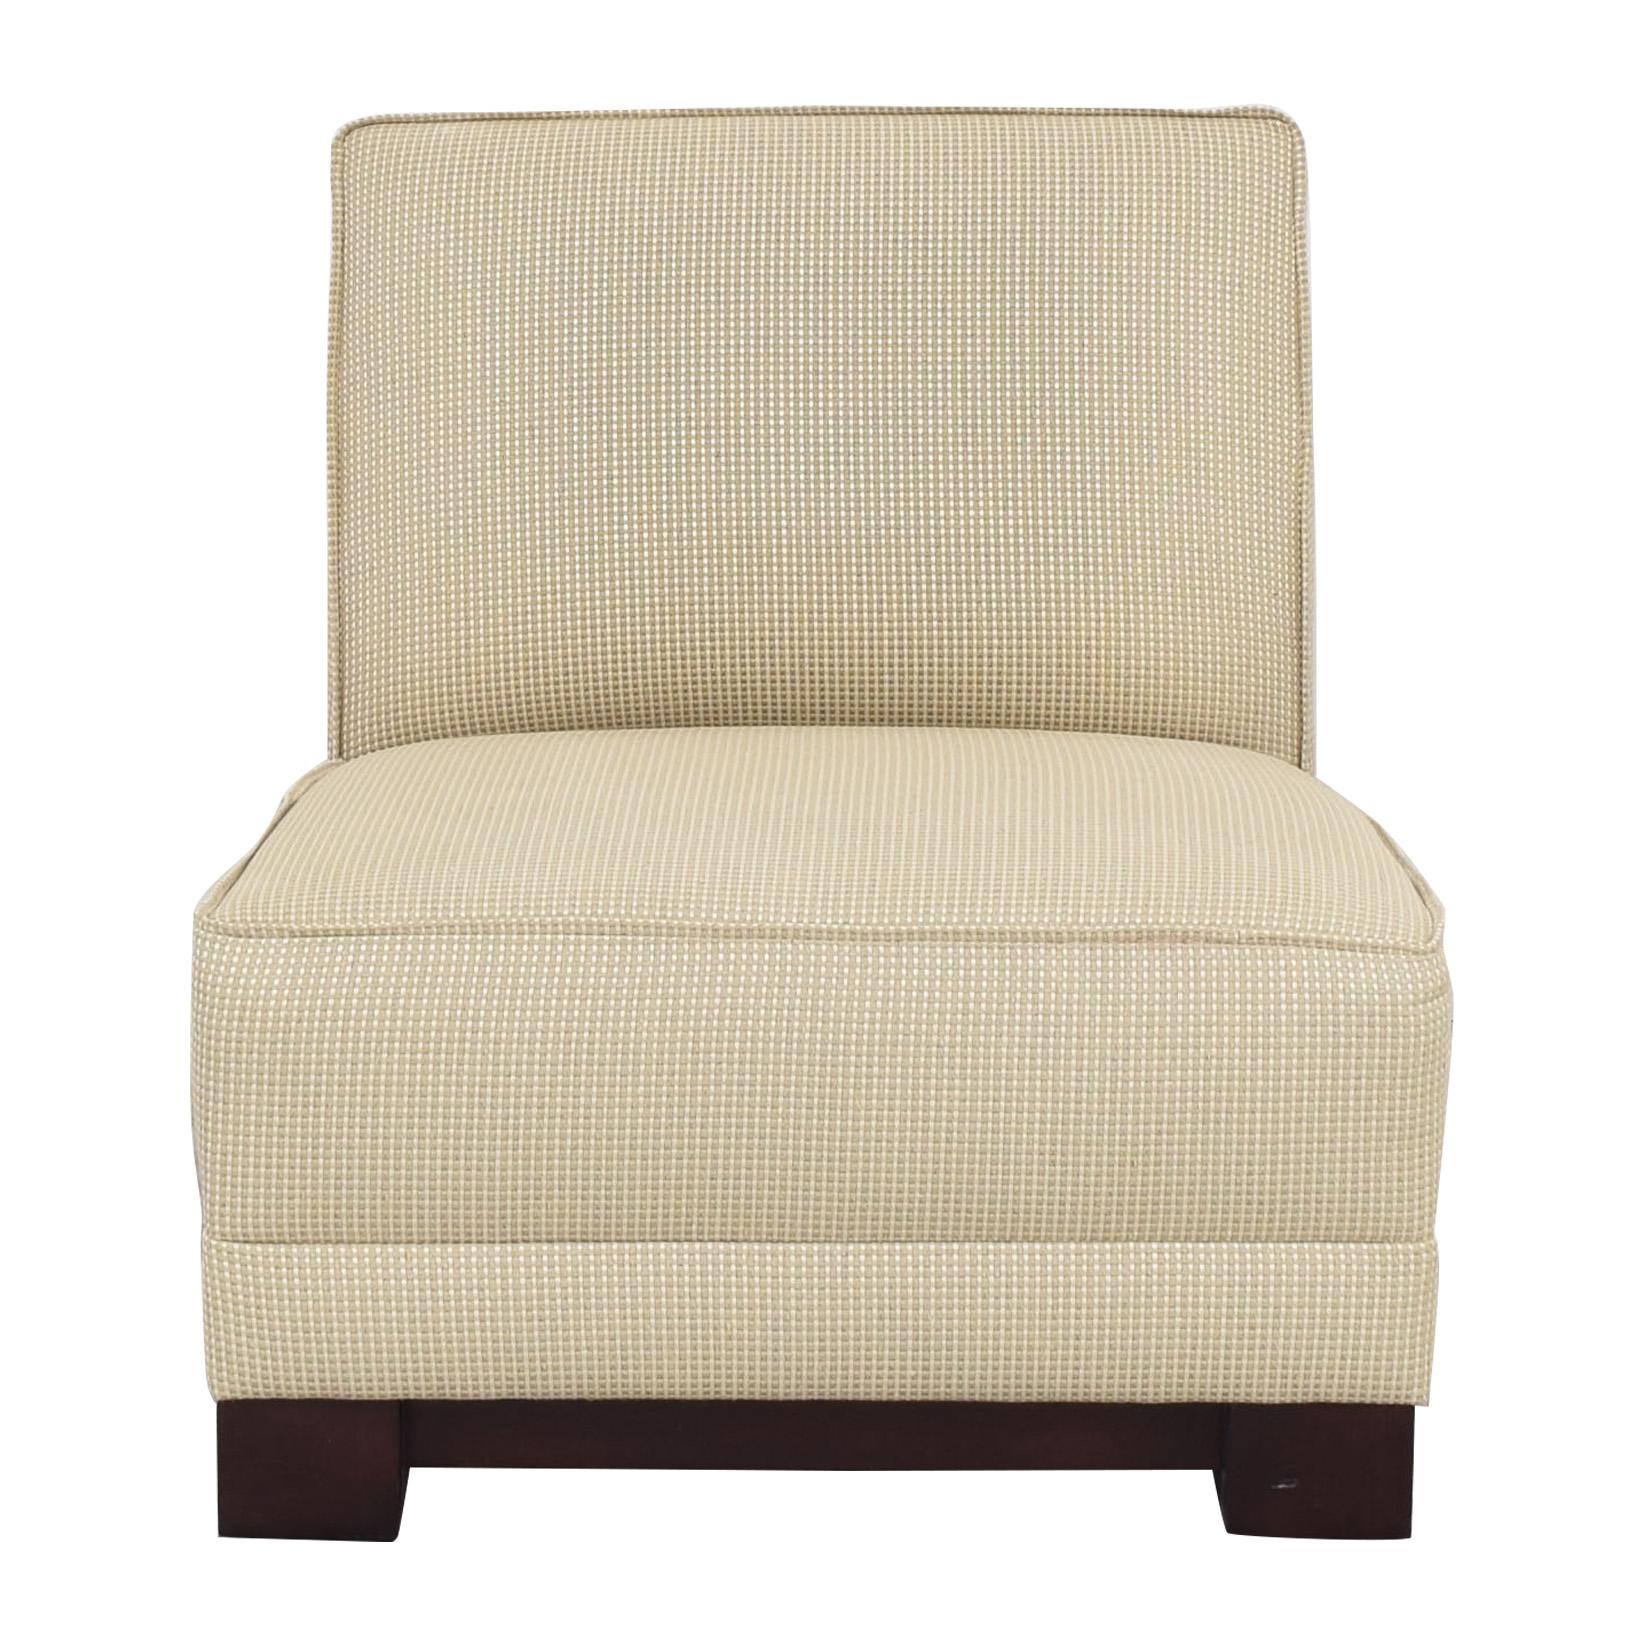 Ralph Lauren Home Hasley Slipper Chair sale